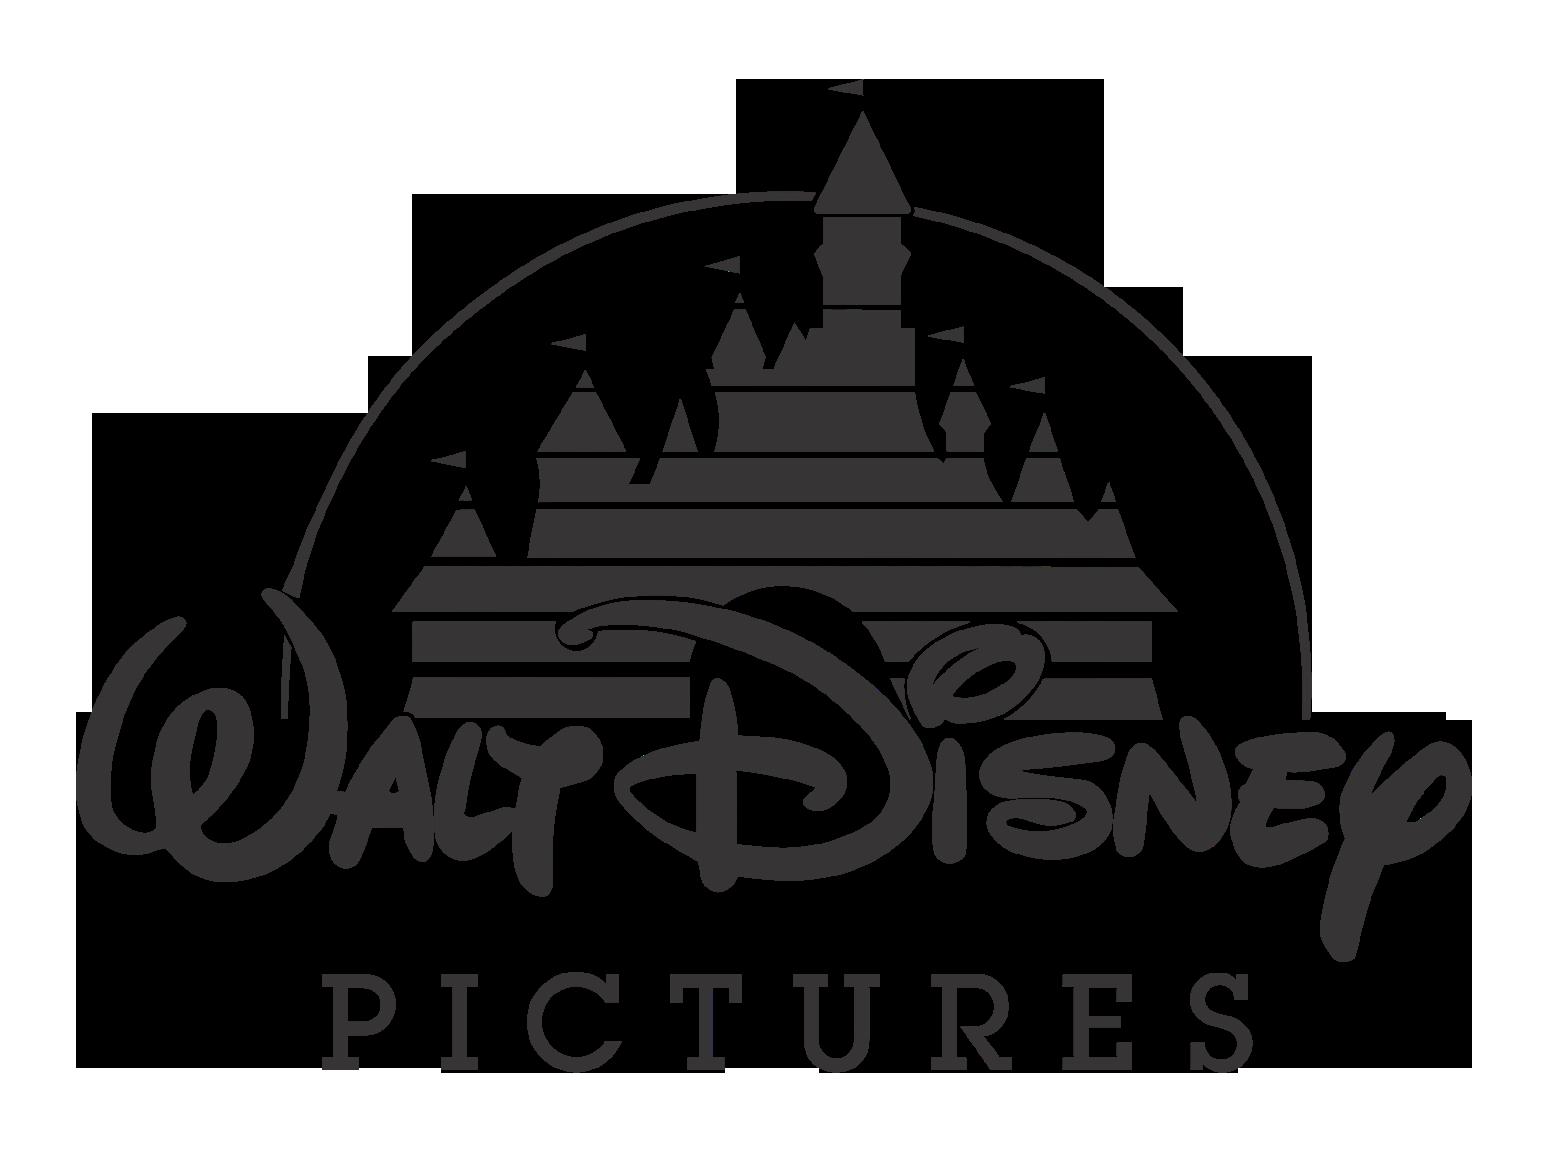 walt-disney-pictures-logo-png-transparent-6.png